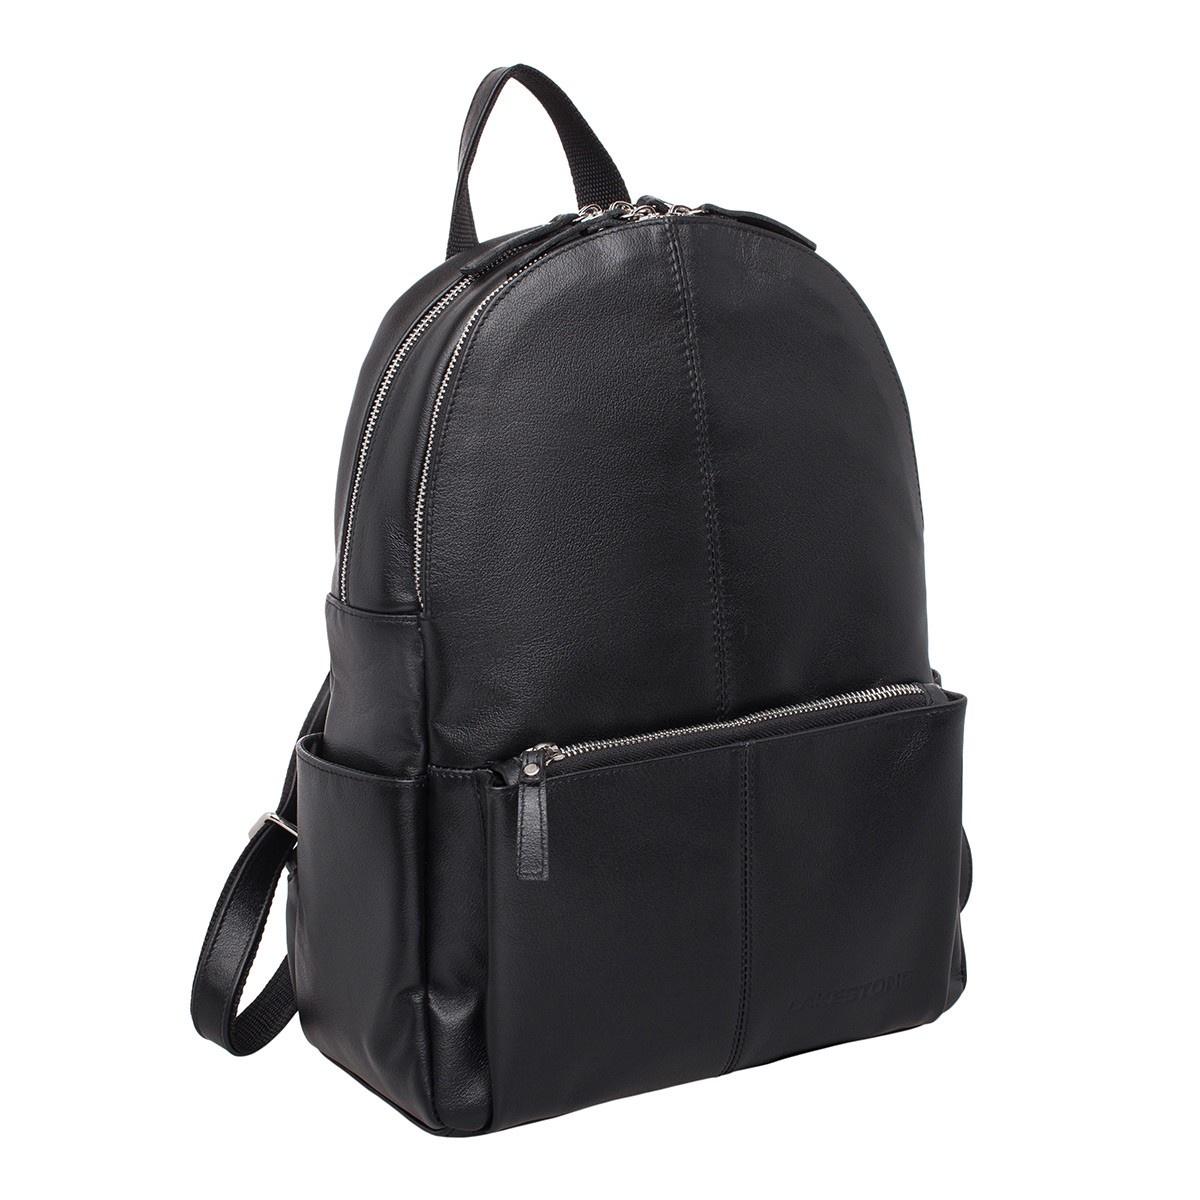 Рюкзак LAKESTONE Belfry Black, черный